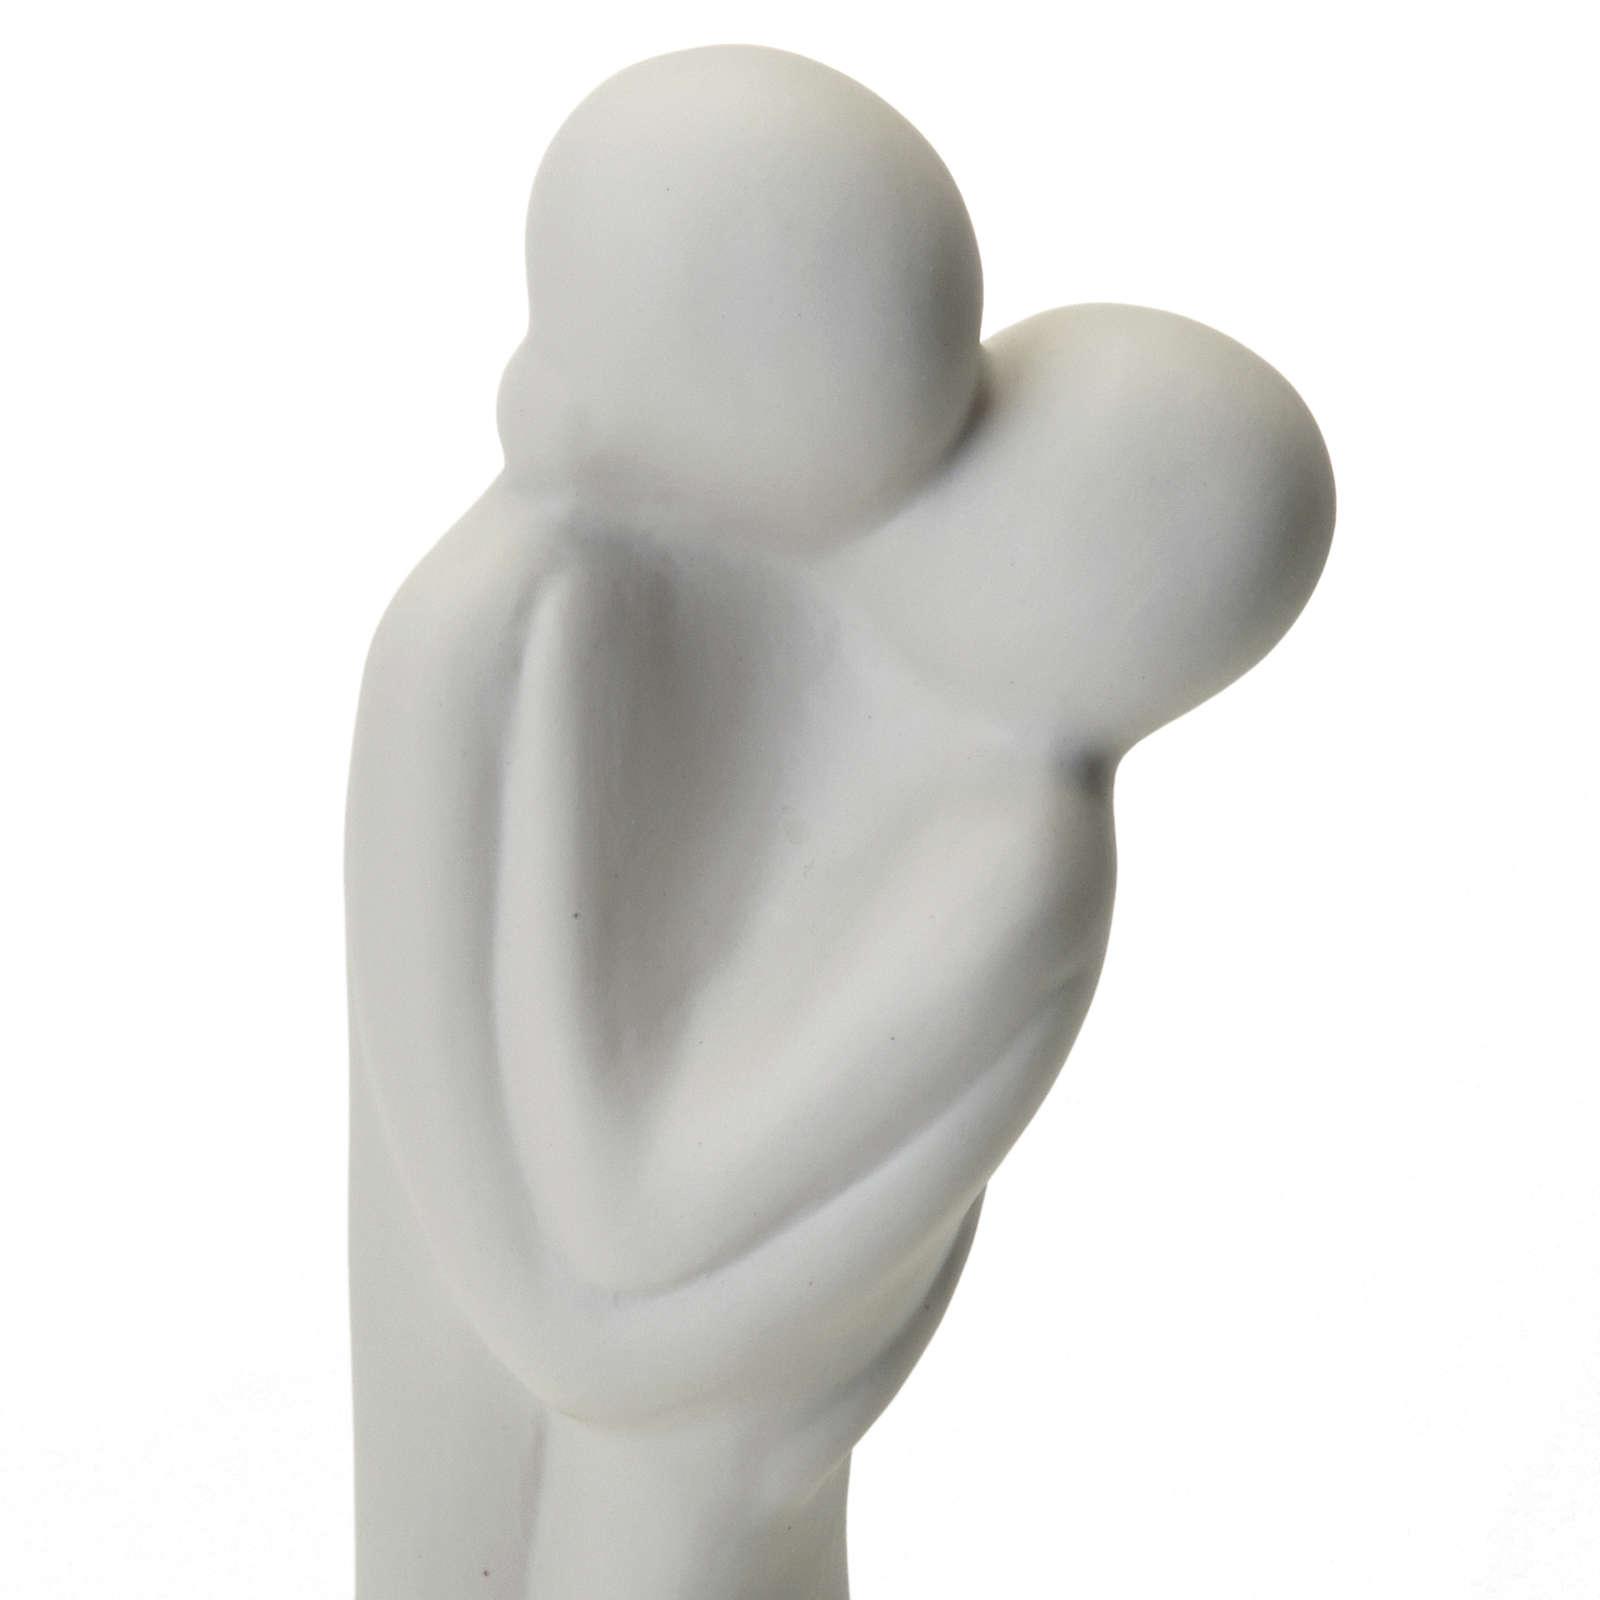 O beijo porcelana Francesco Pinton 16-31-46 cm 4